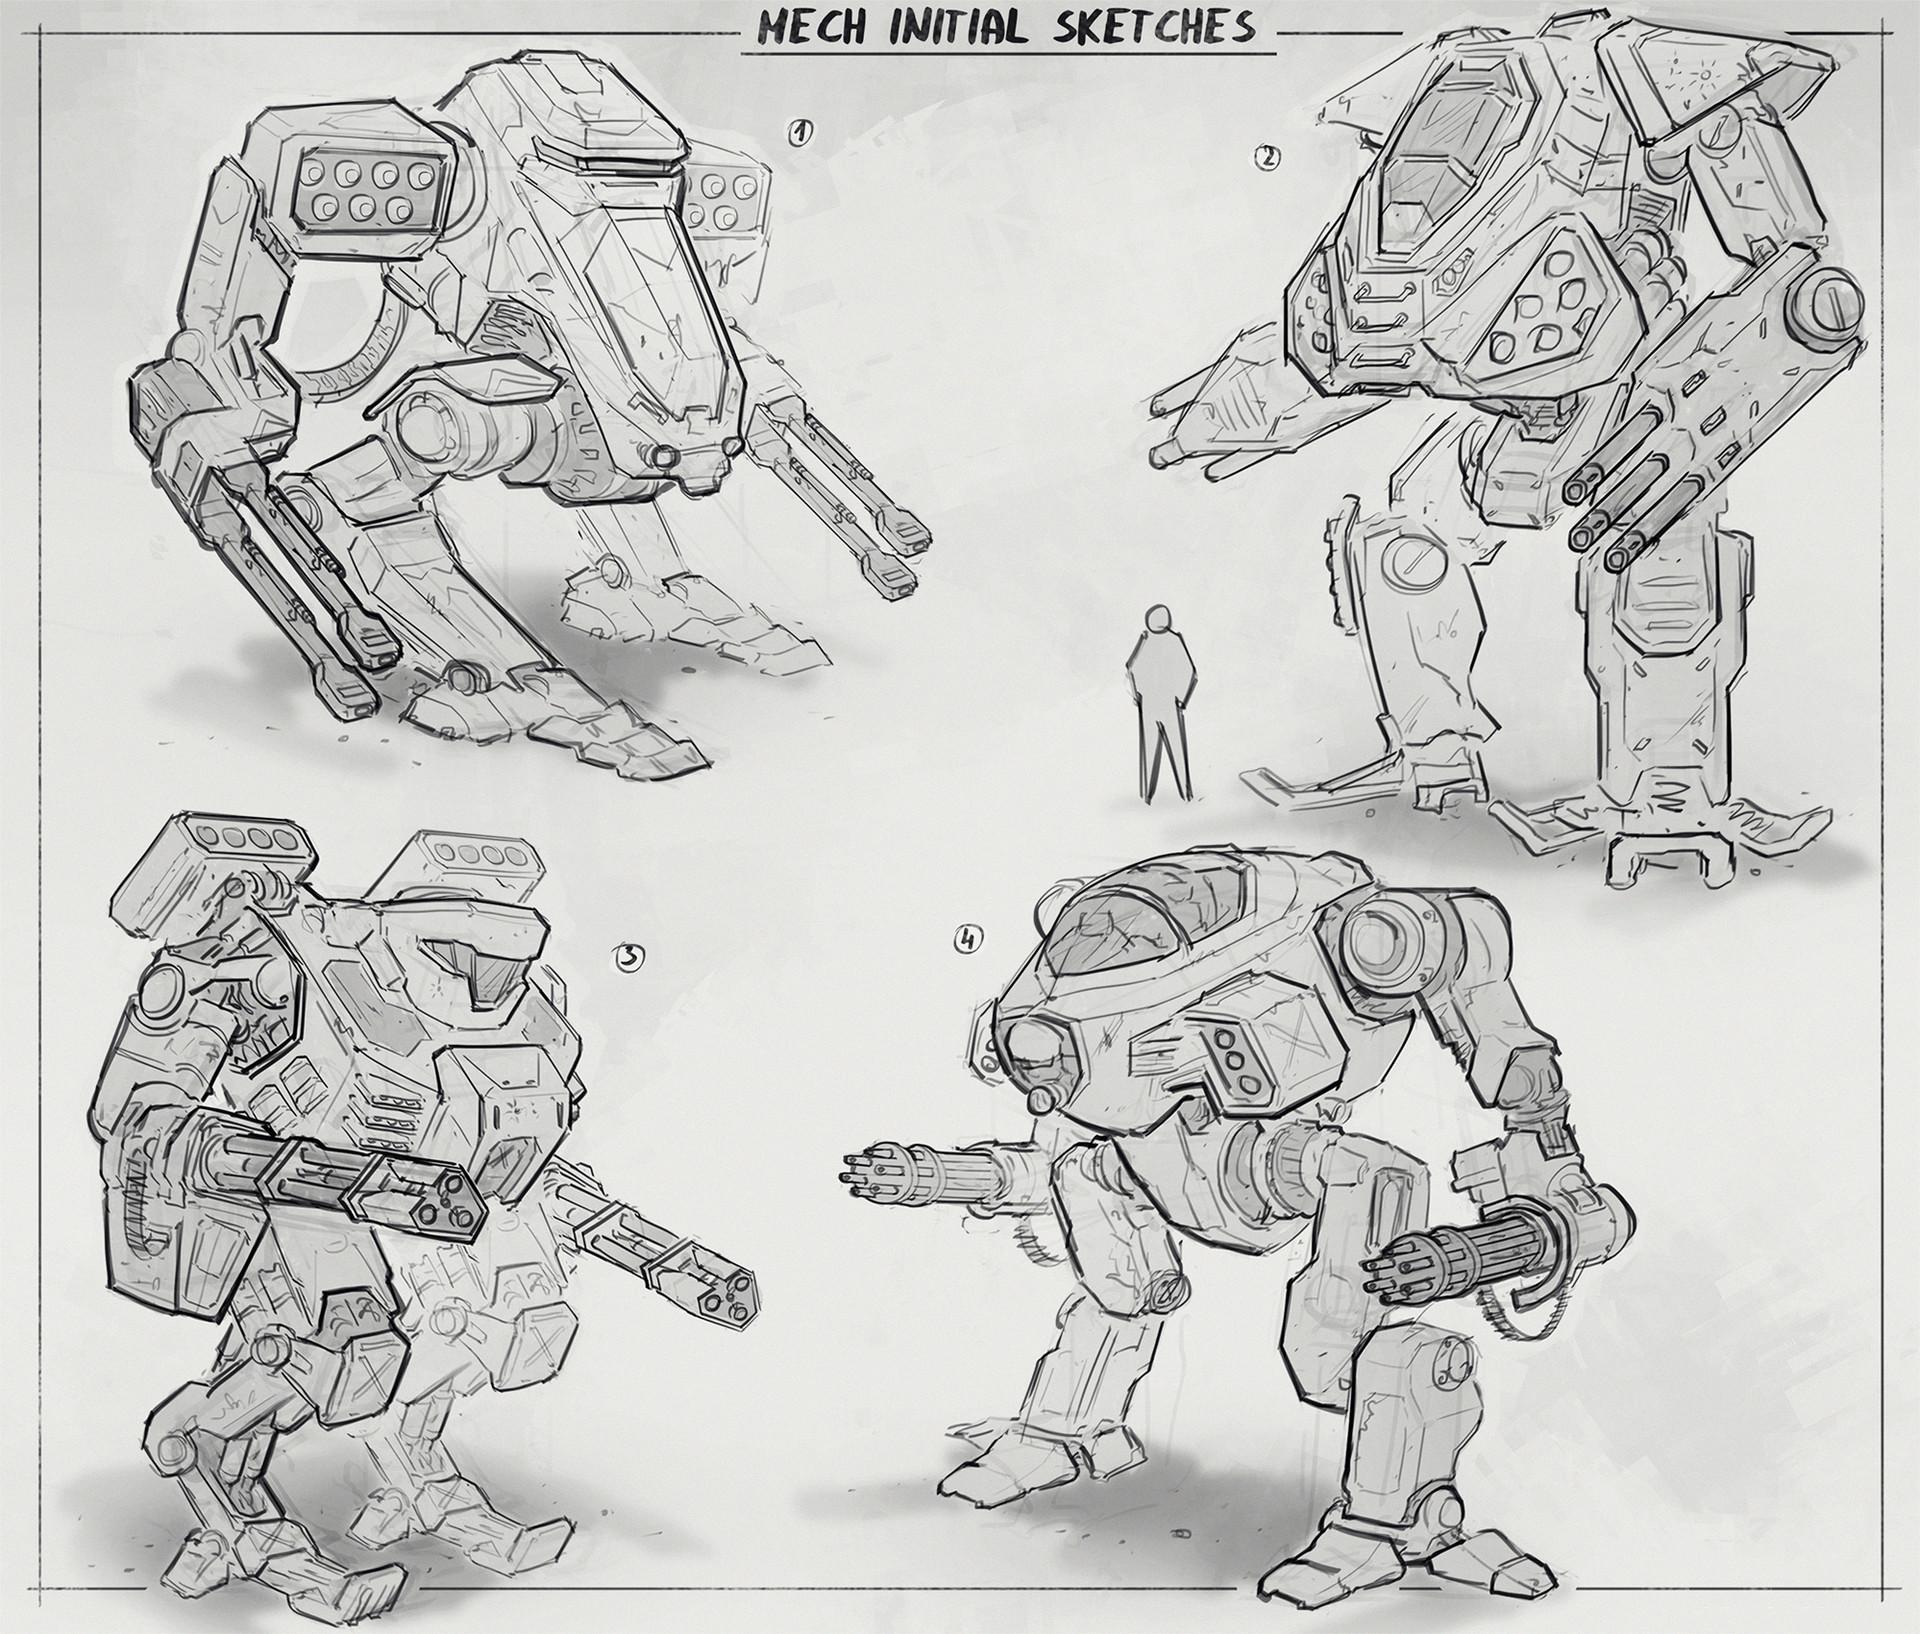 Martynas latusinskas mech initial sketches 1 martynas latusinskas